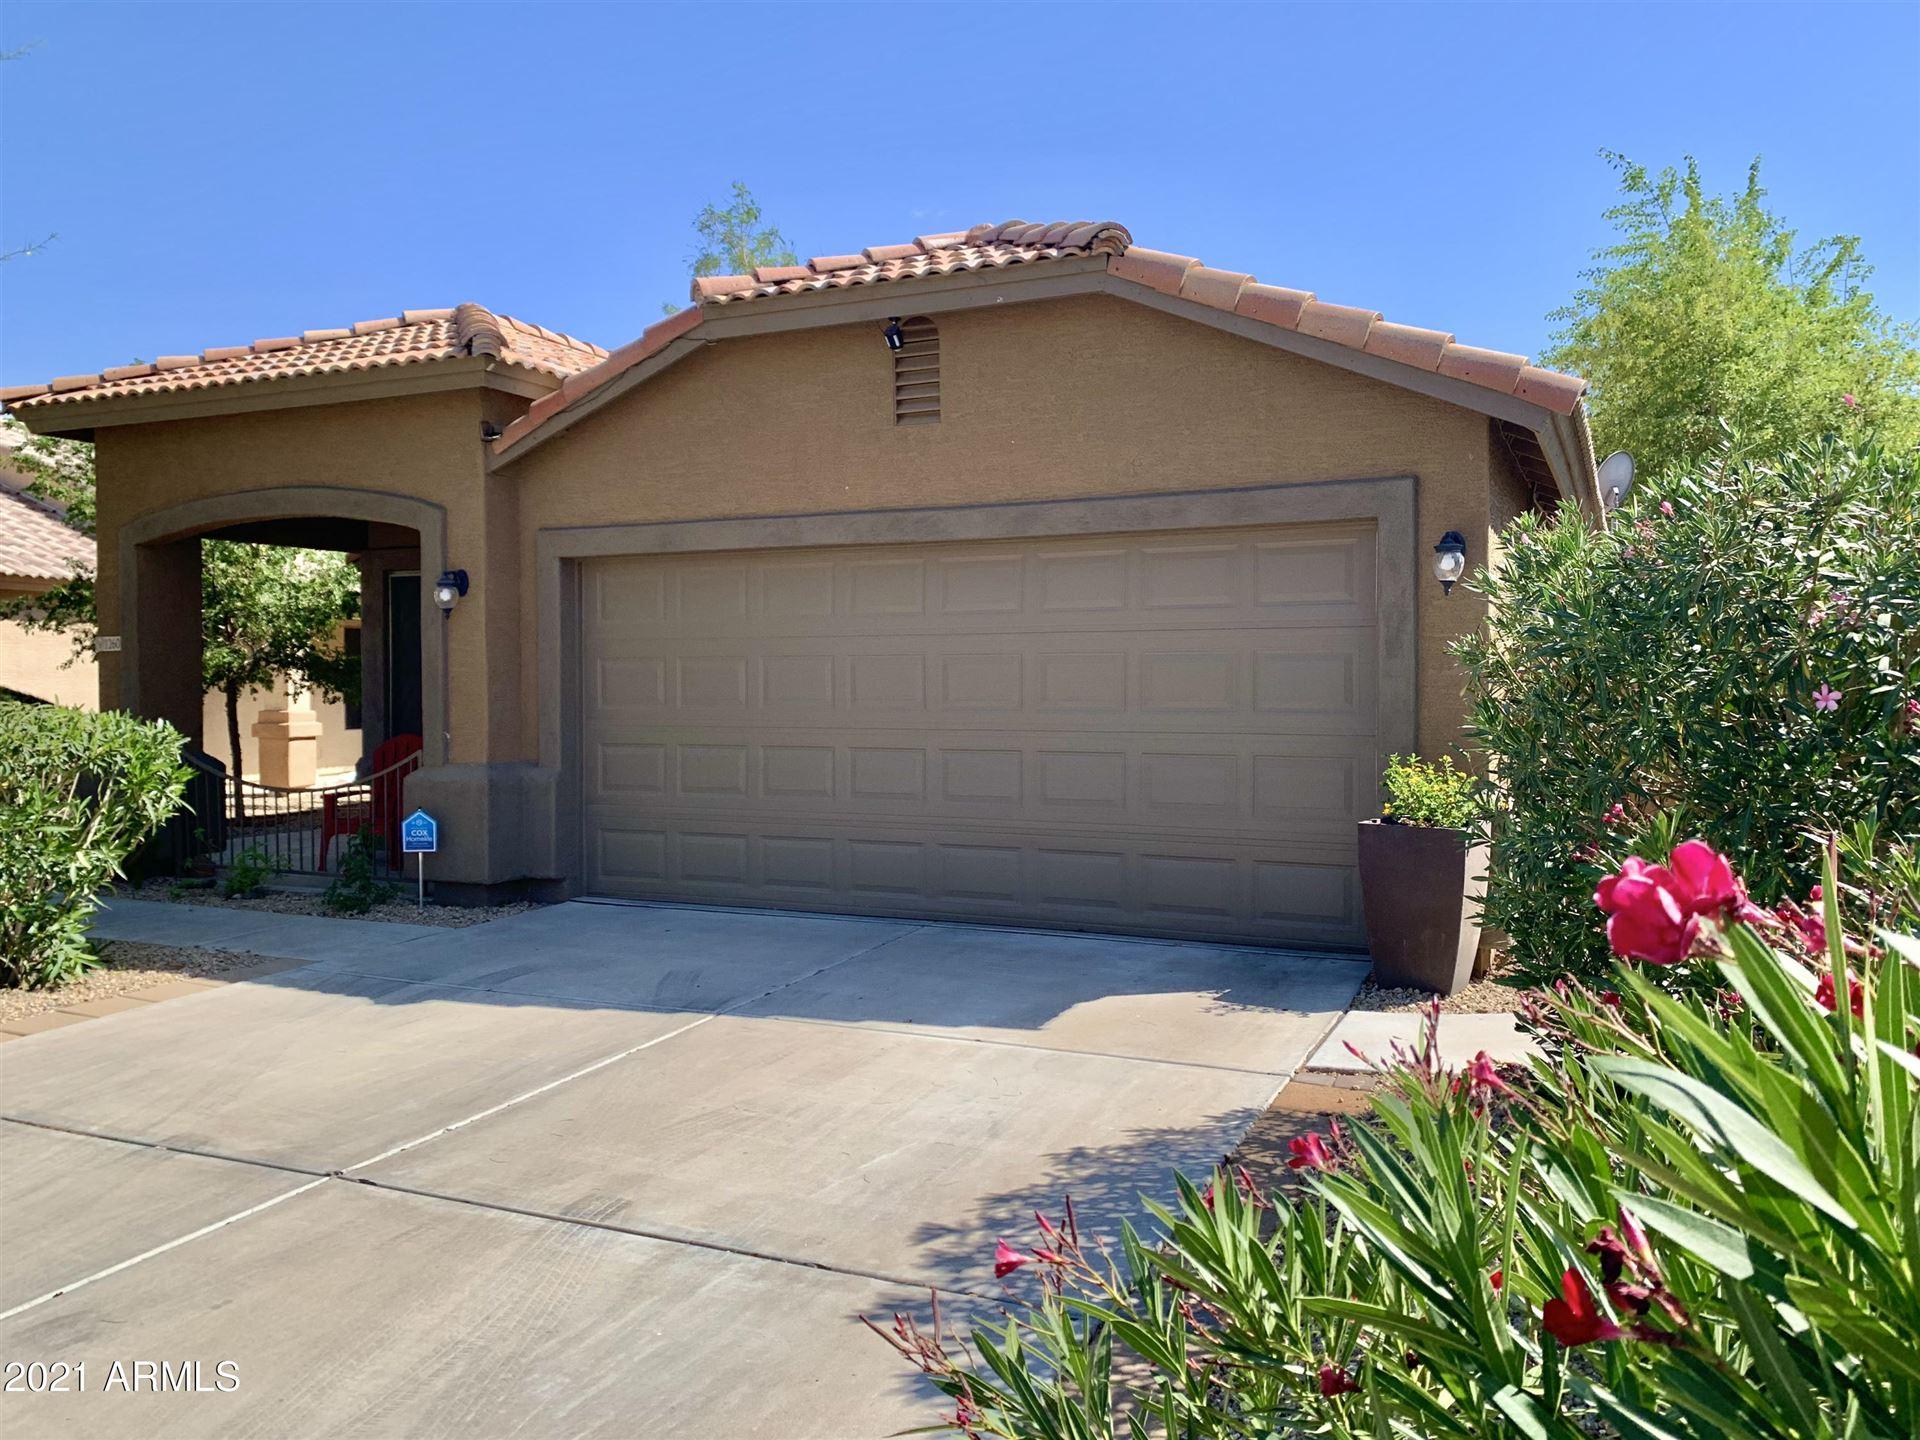 Photo of 12609 W FAIRMOUNT Avenue, Avondale, AZ 85392 (MLS # 6223668)